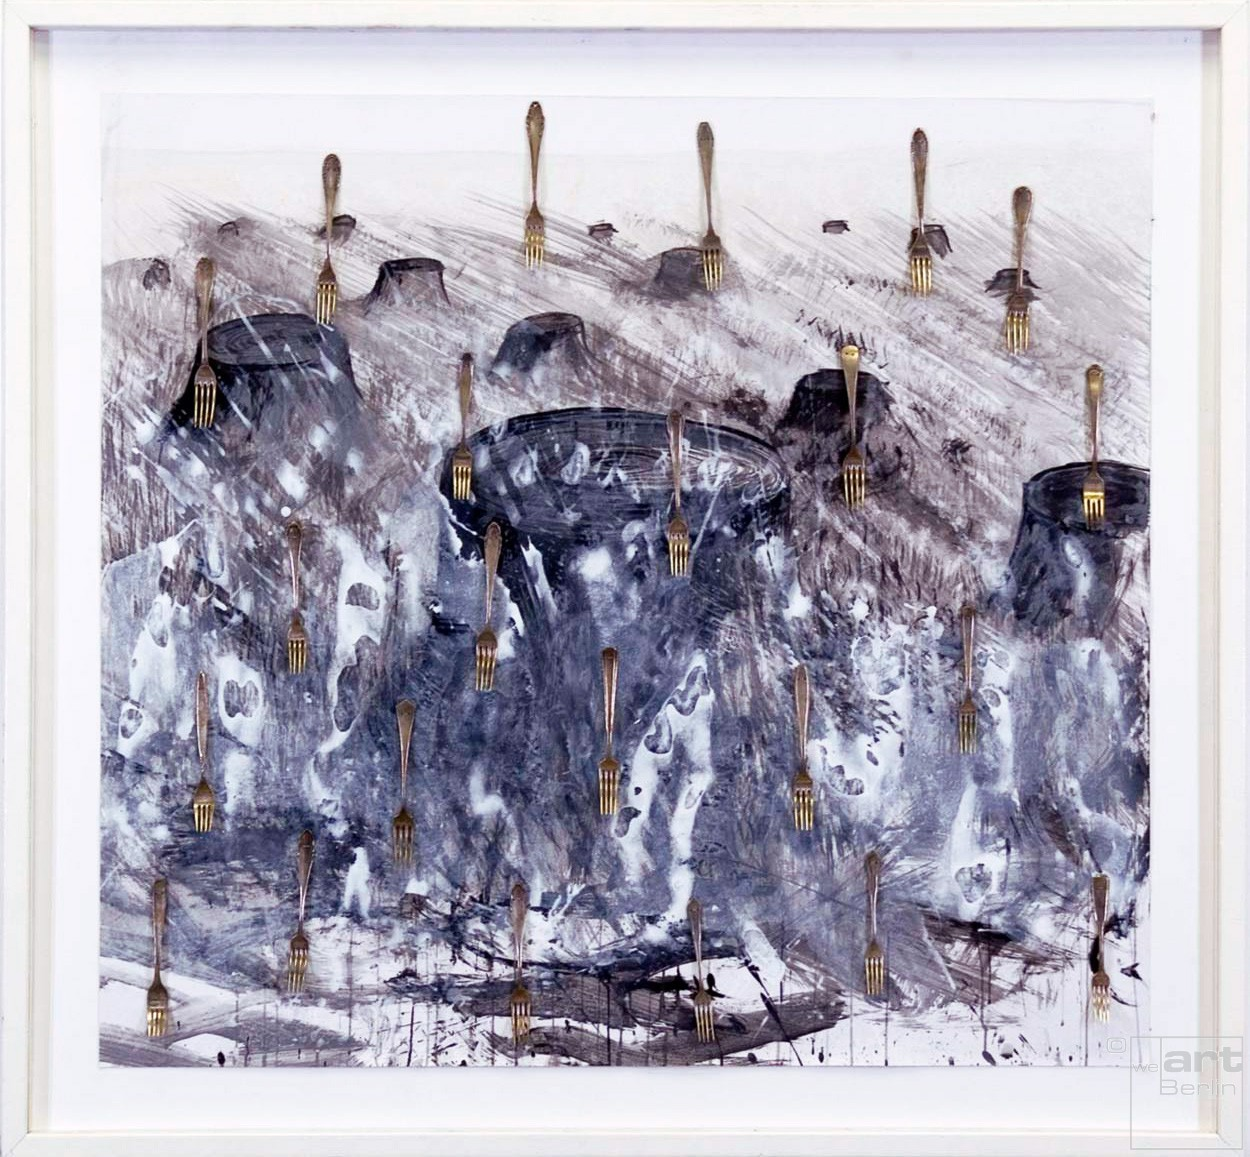 Delikatessen | Mixed Media Malerei | Künstler Marek Schovanek | Silbergabeln, Tusche, Kohle, Latexfarbe auf Papier